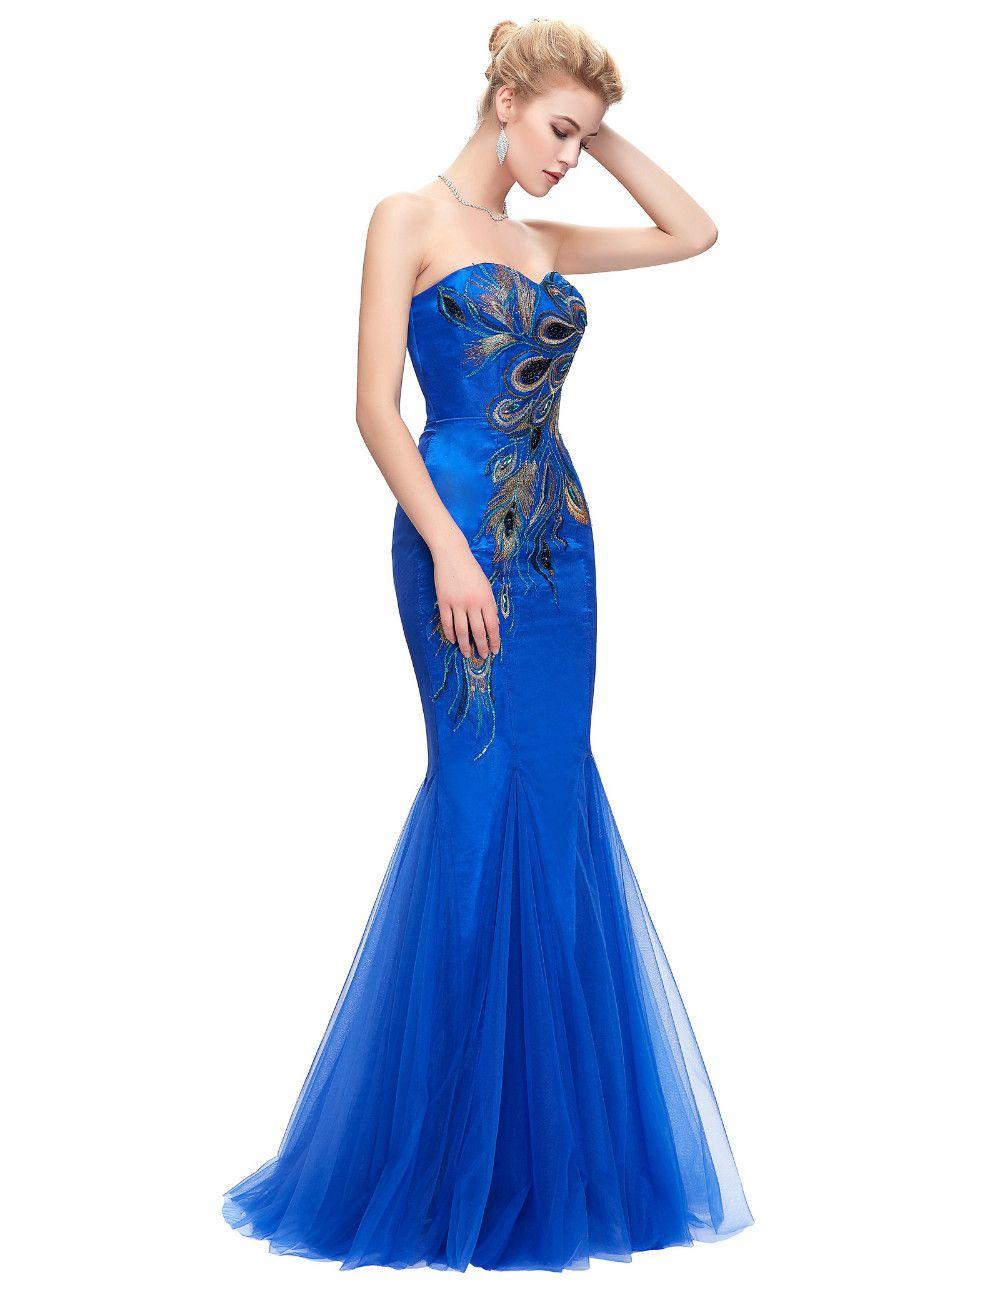 Elegant peacock strapless long mermaid bridesmaid dress uniqistic